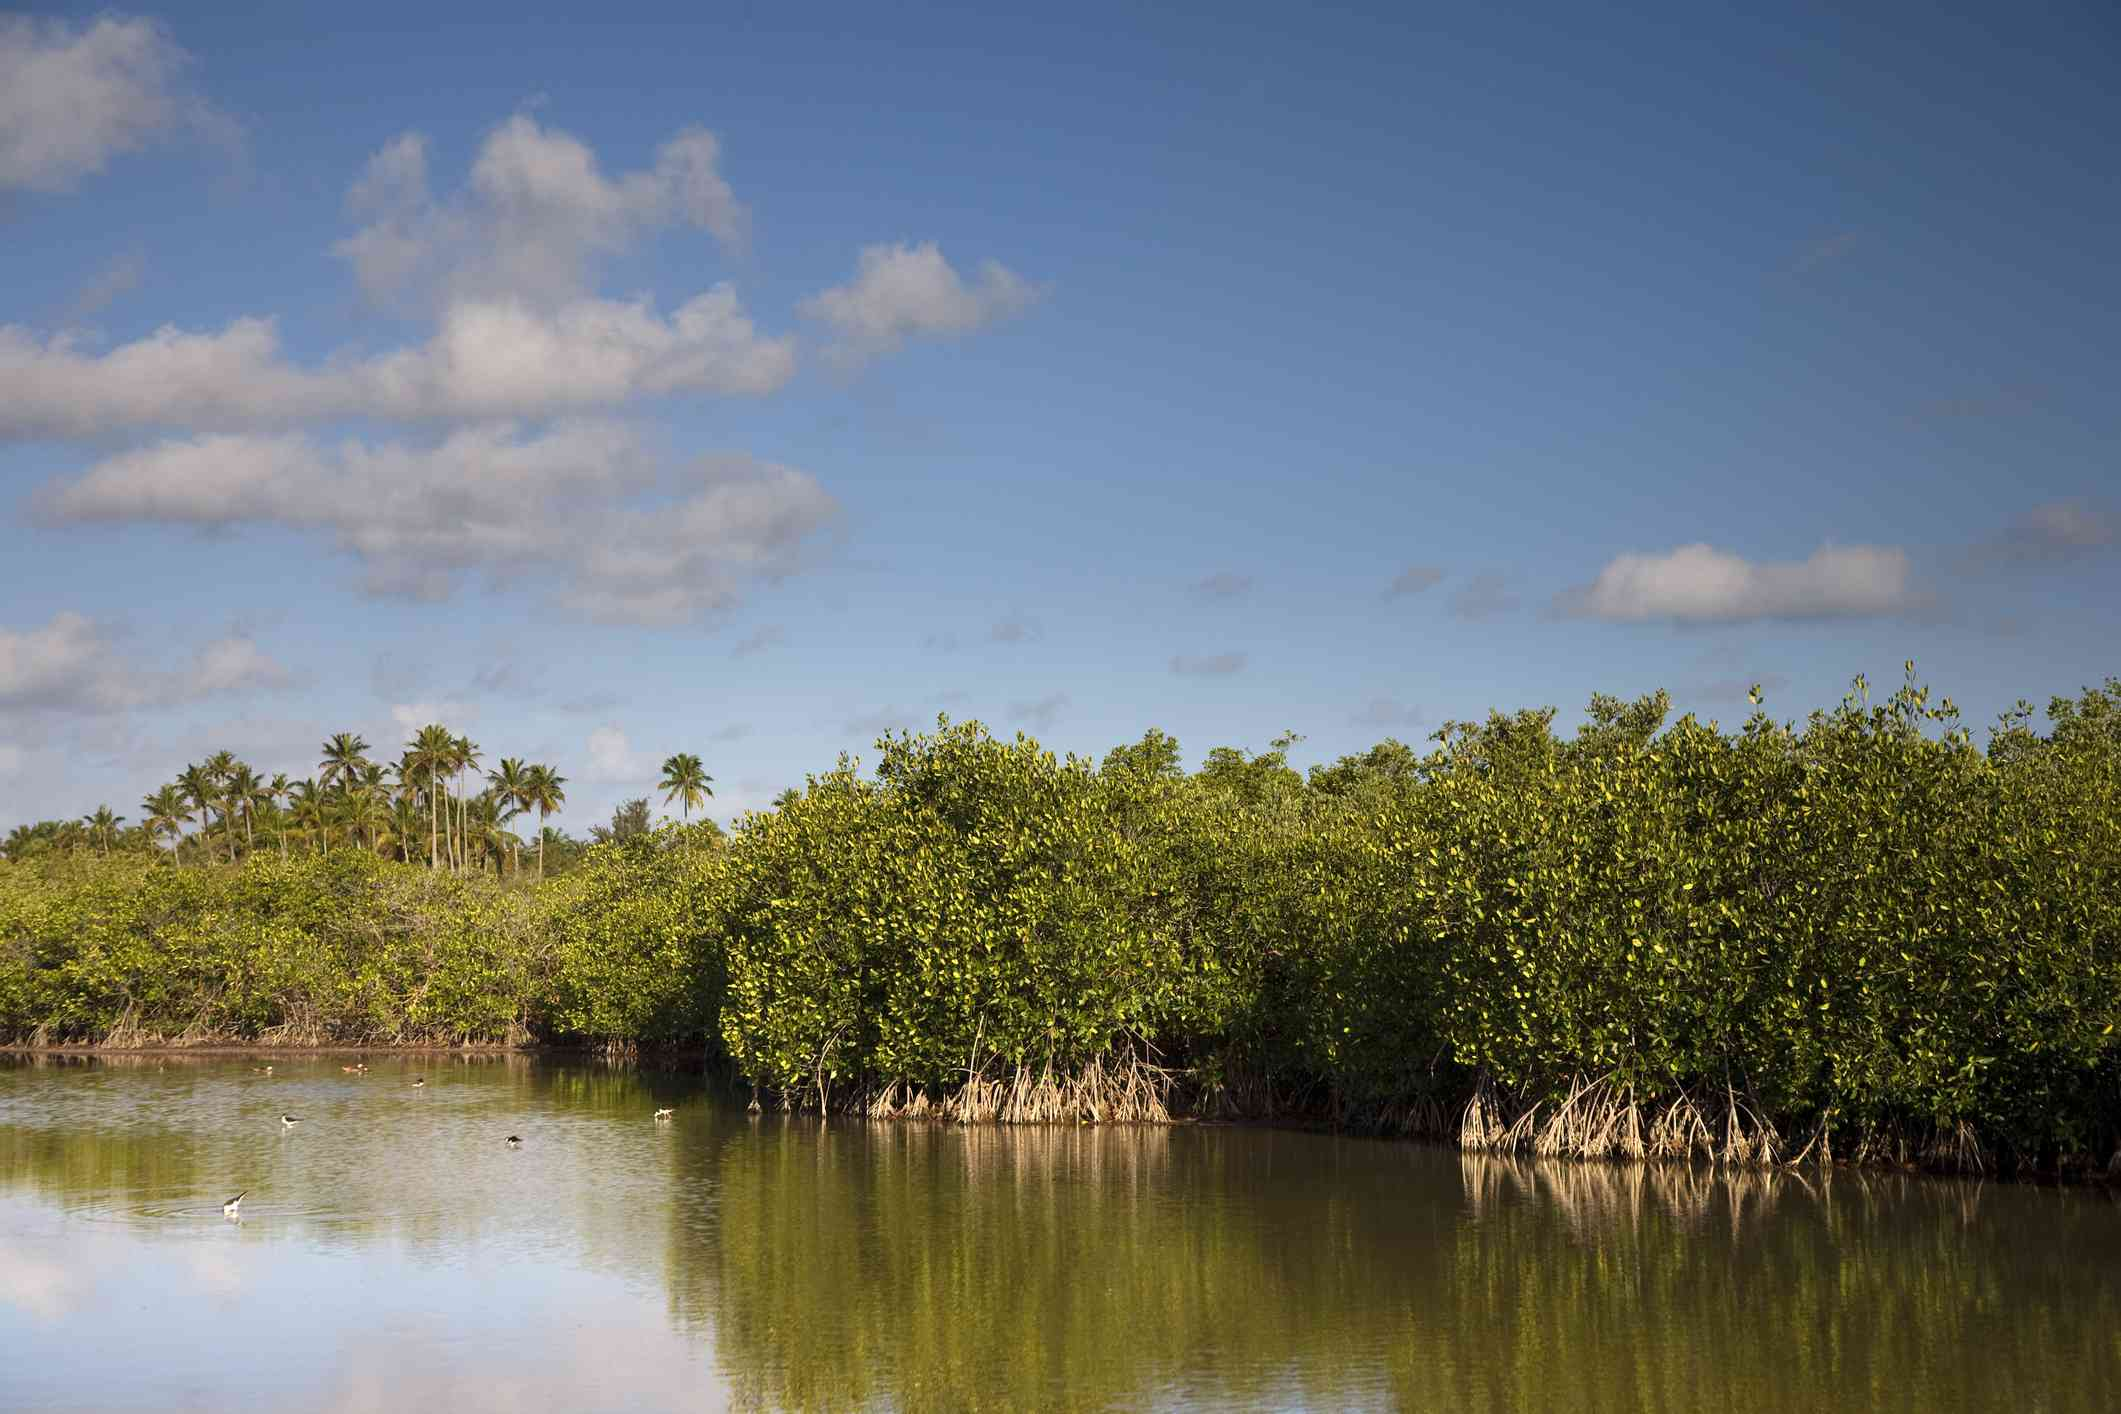 Puerto Rico, Vieques Island, Kiani Lagoon, Mangroves